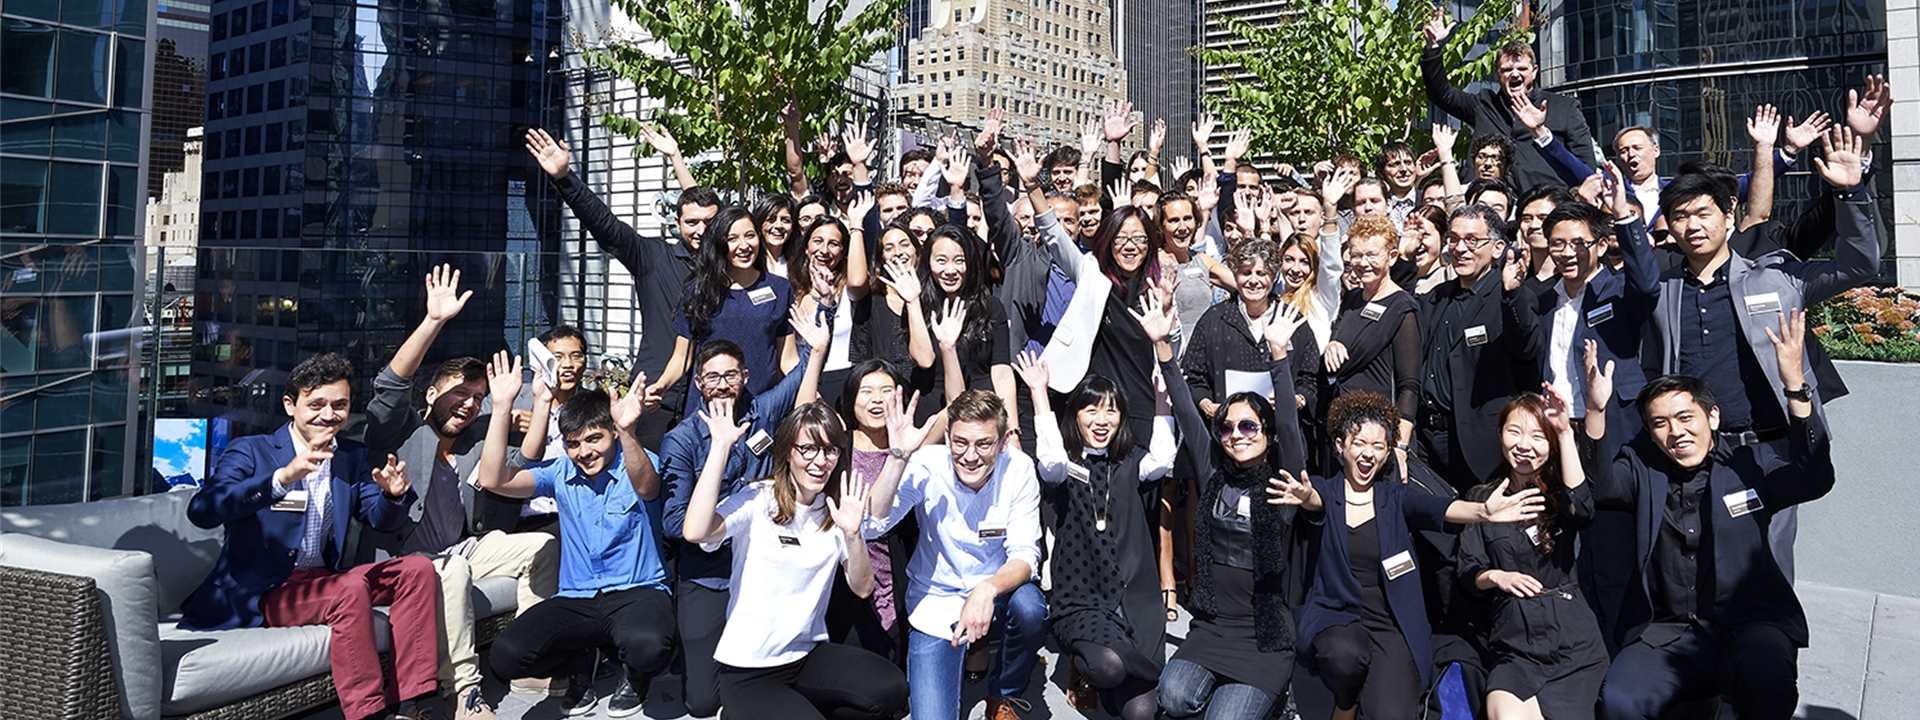 NGLab15_NYC_GroupPhoto_073.jpg